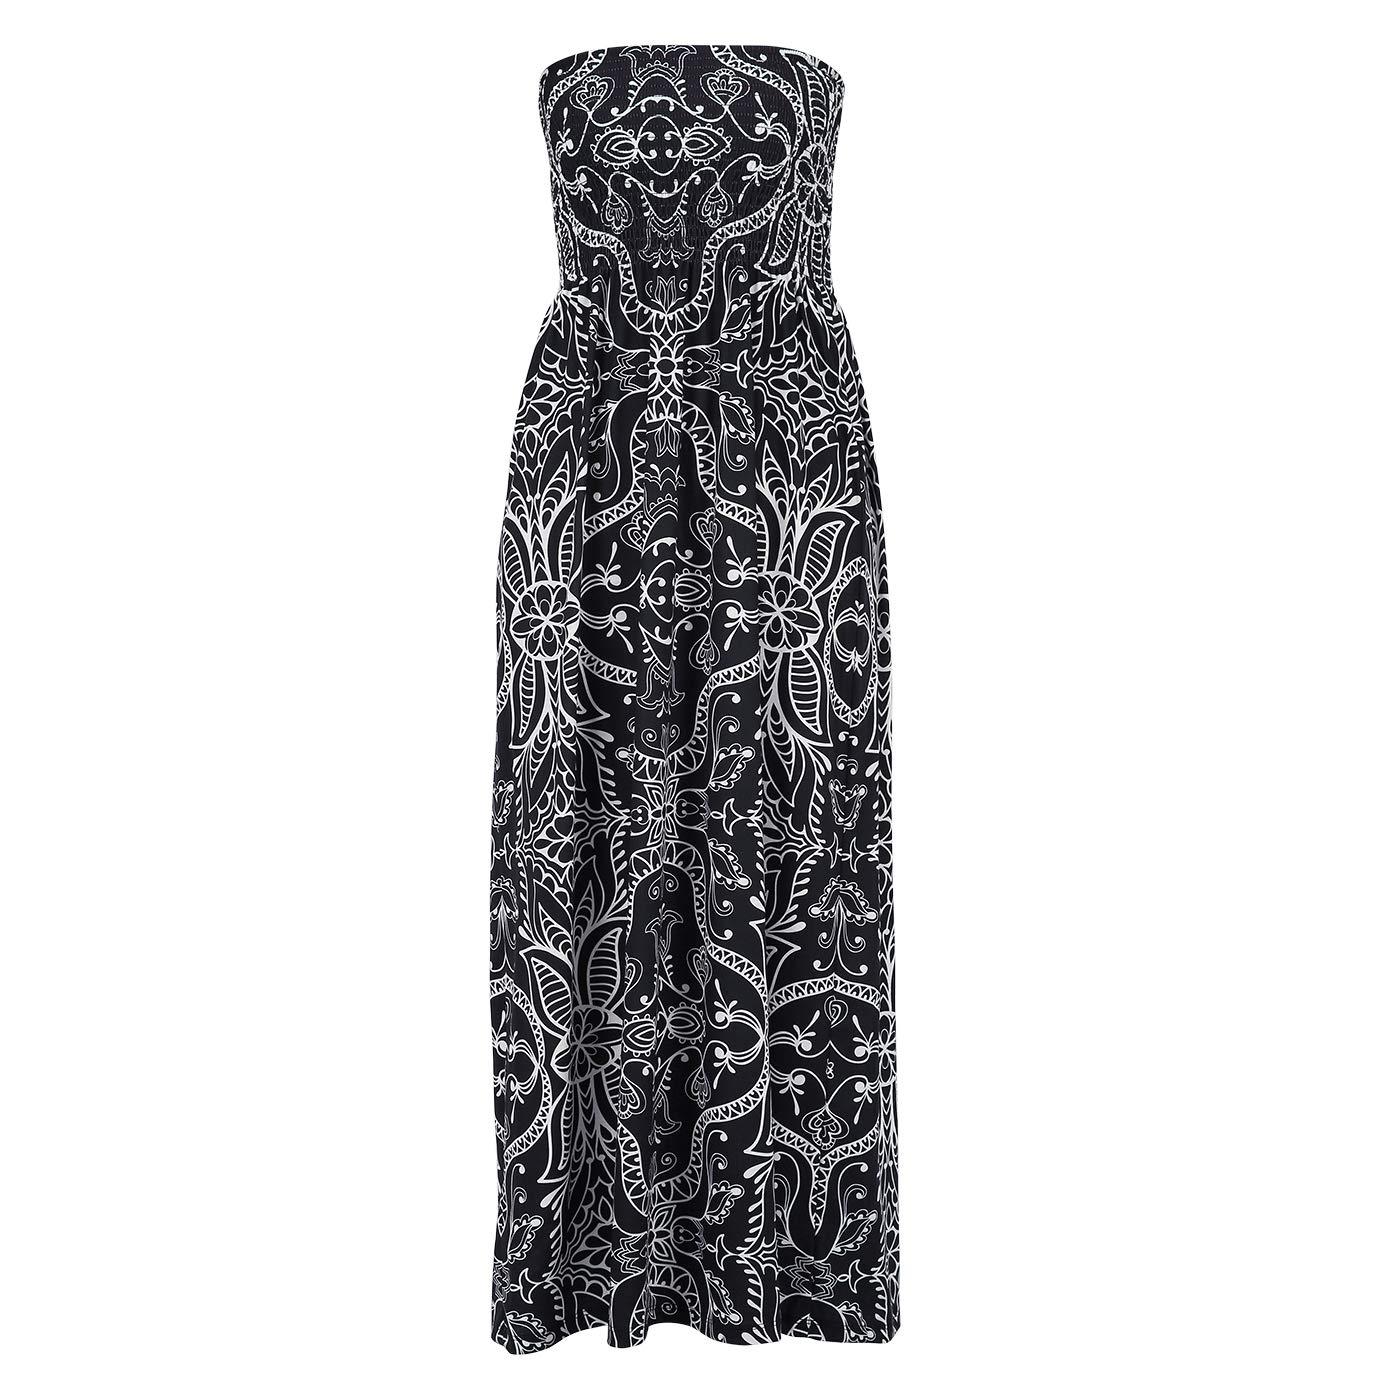 3c6d5e39f80 HDE Women s Strapless Maxi Dress Plus Size Tube Top Long Skirt Sundress  Cover Up  Amazon.co.uk  Clothing